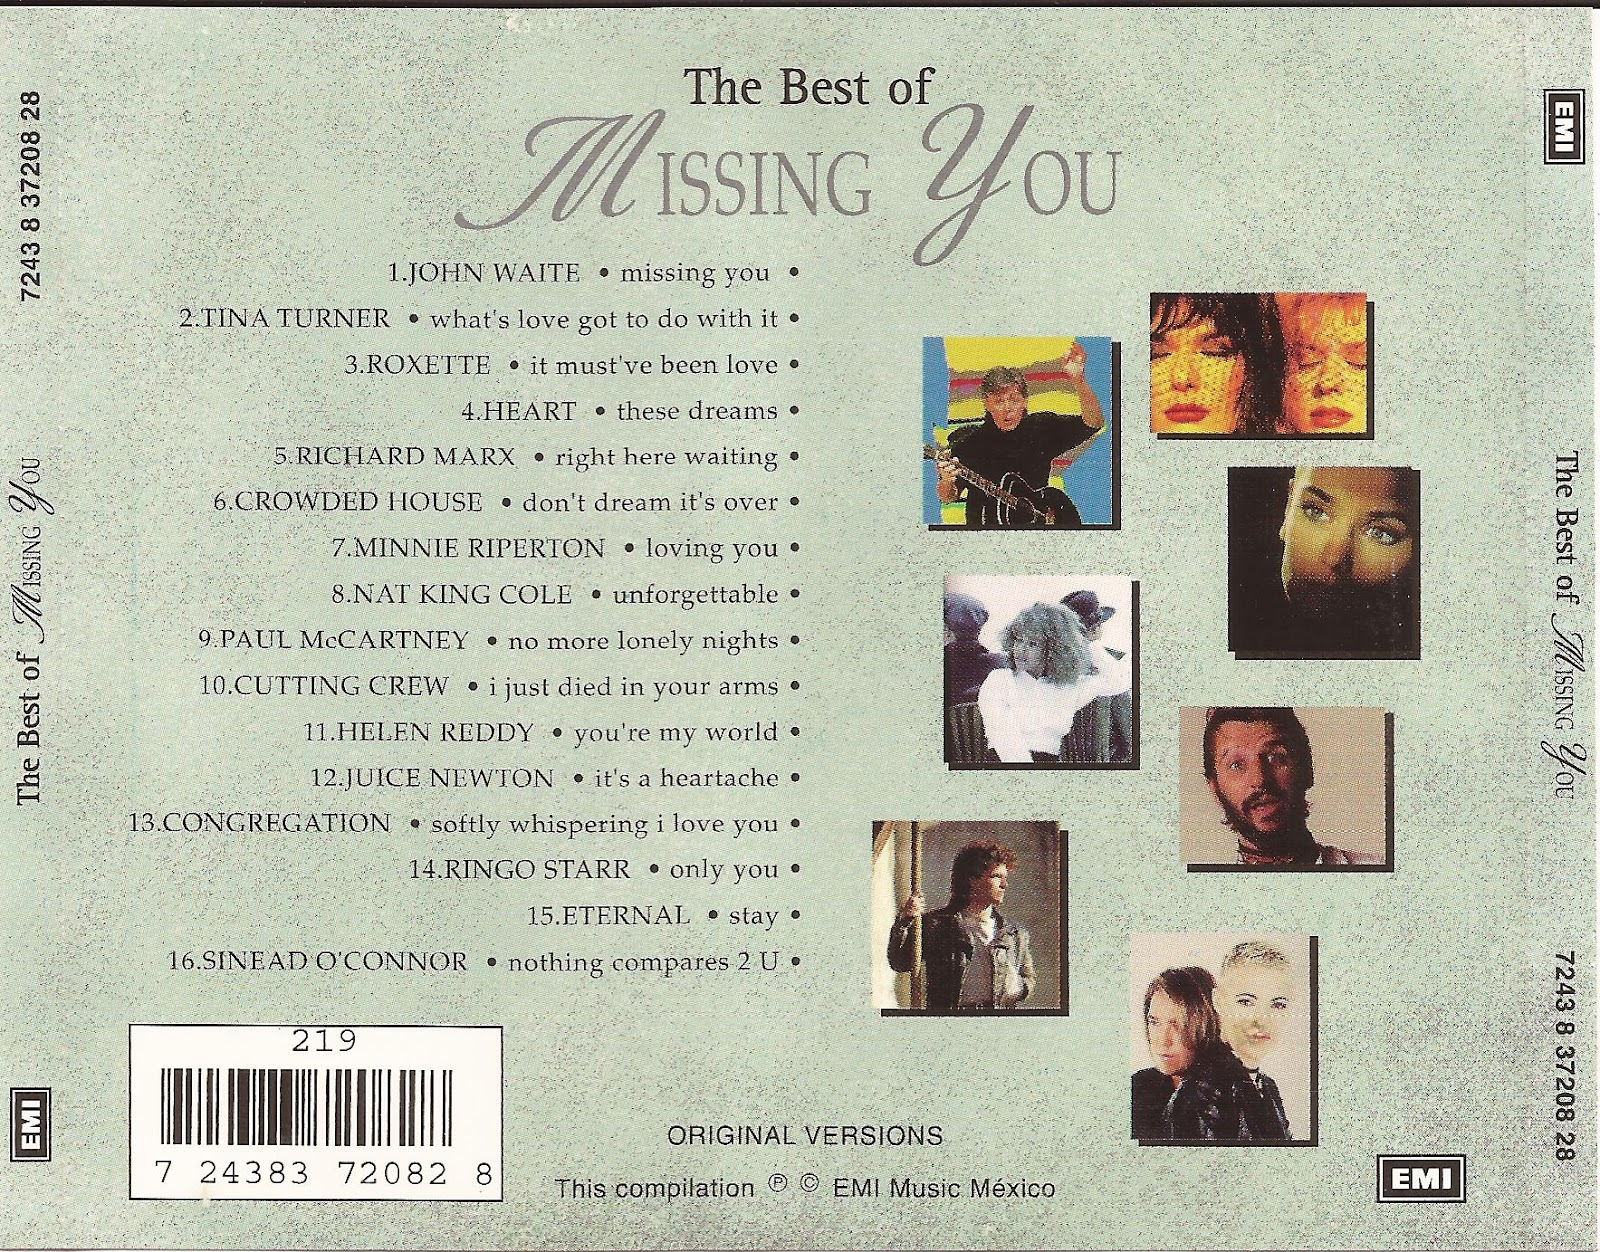 http://2.bp.blogspot.com/-RDp-uAyL7XY/T3kMcBDN1uI/AAAAAAAACQg/LDHA8TlxKXs/s1600/Best+Of+Missing+You+contraportada.jpg